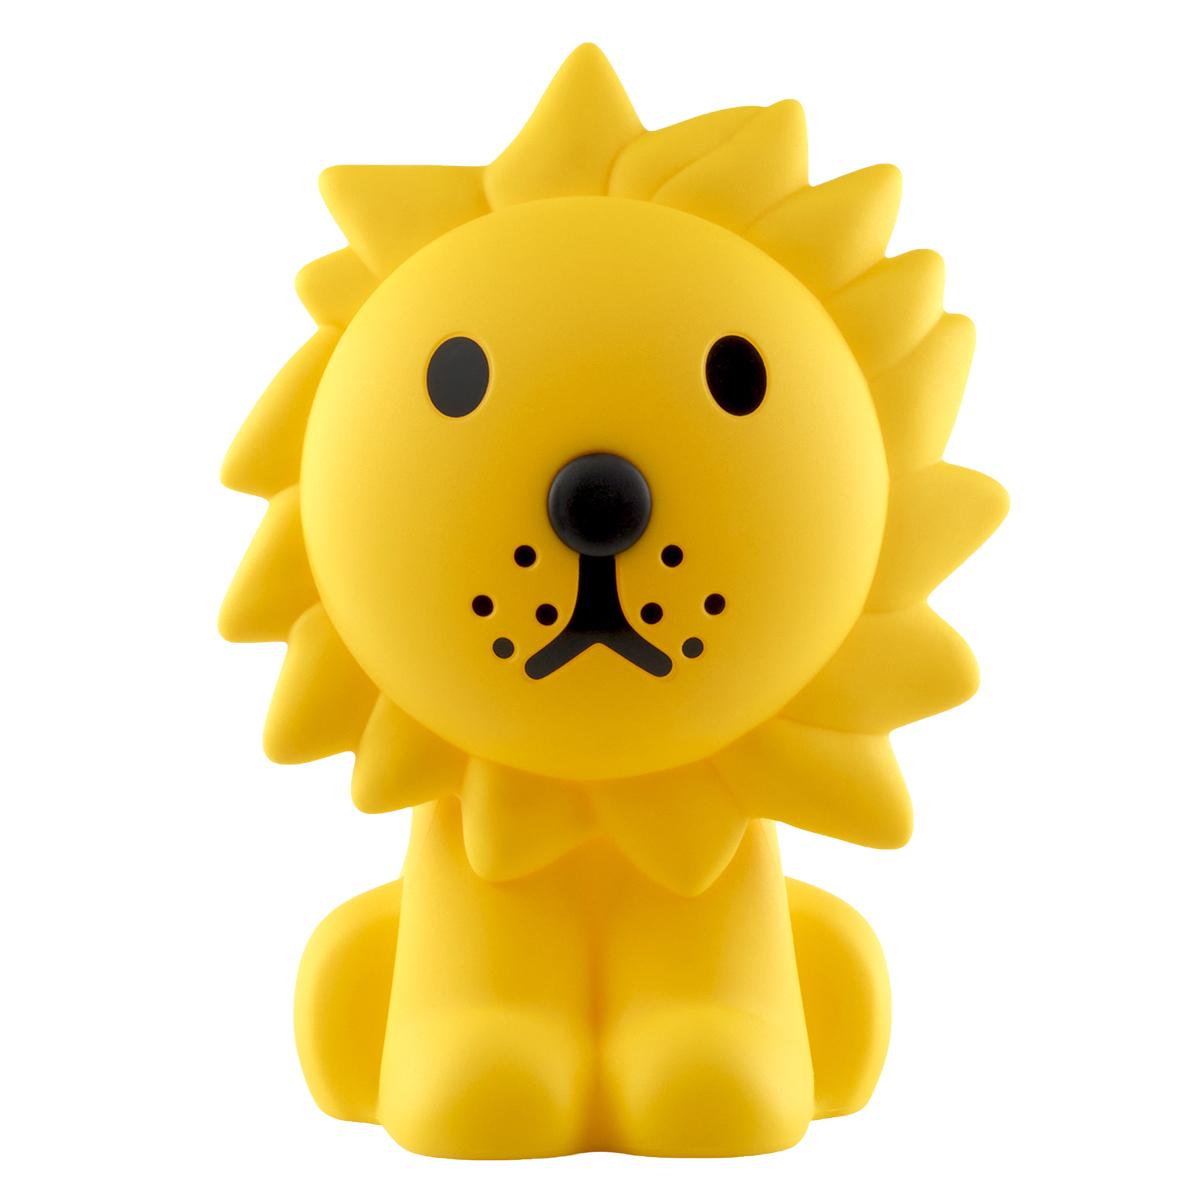 Lampe à poser Lampe Lion Star Light 41 cm - Jaune Lampe Lion Star Light 41 cm - Jaune